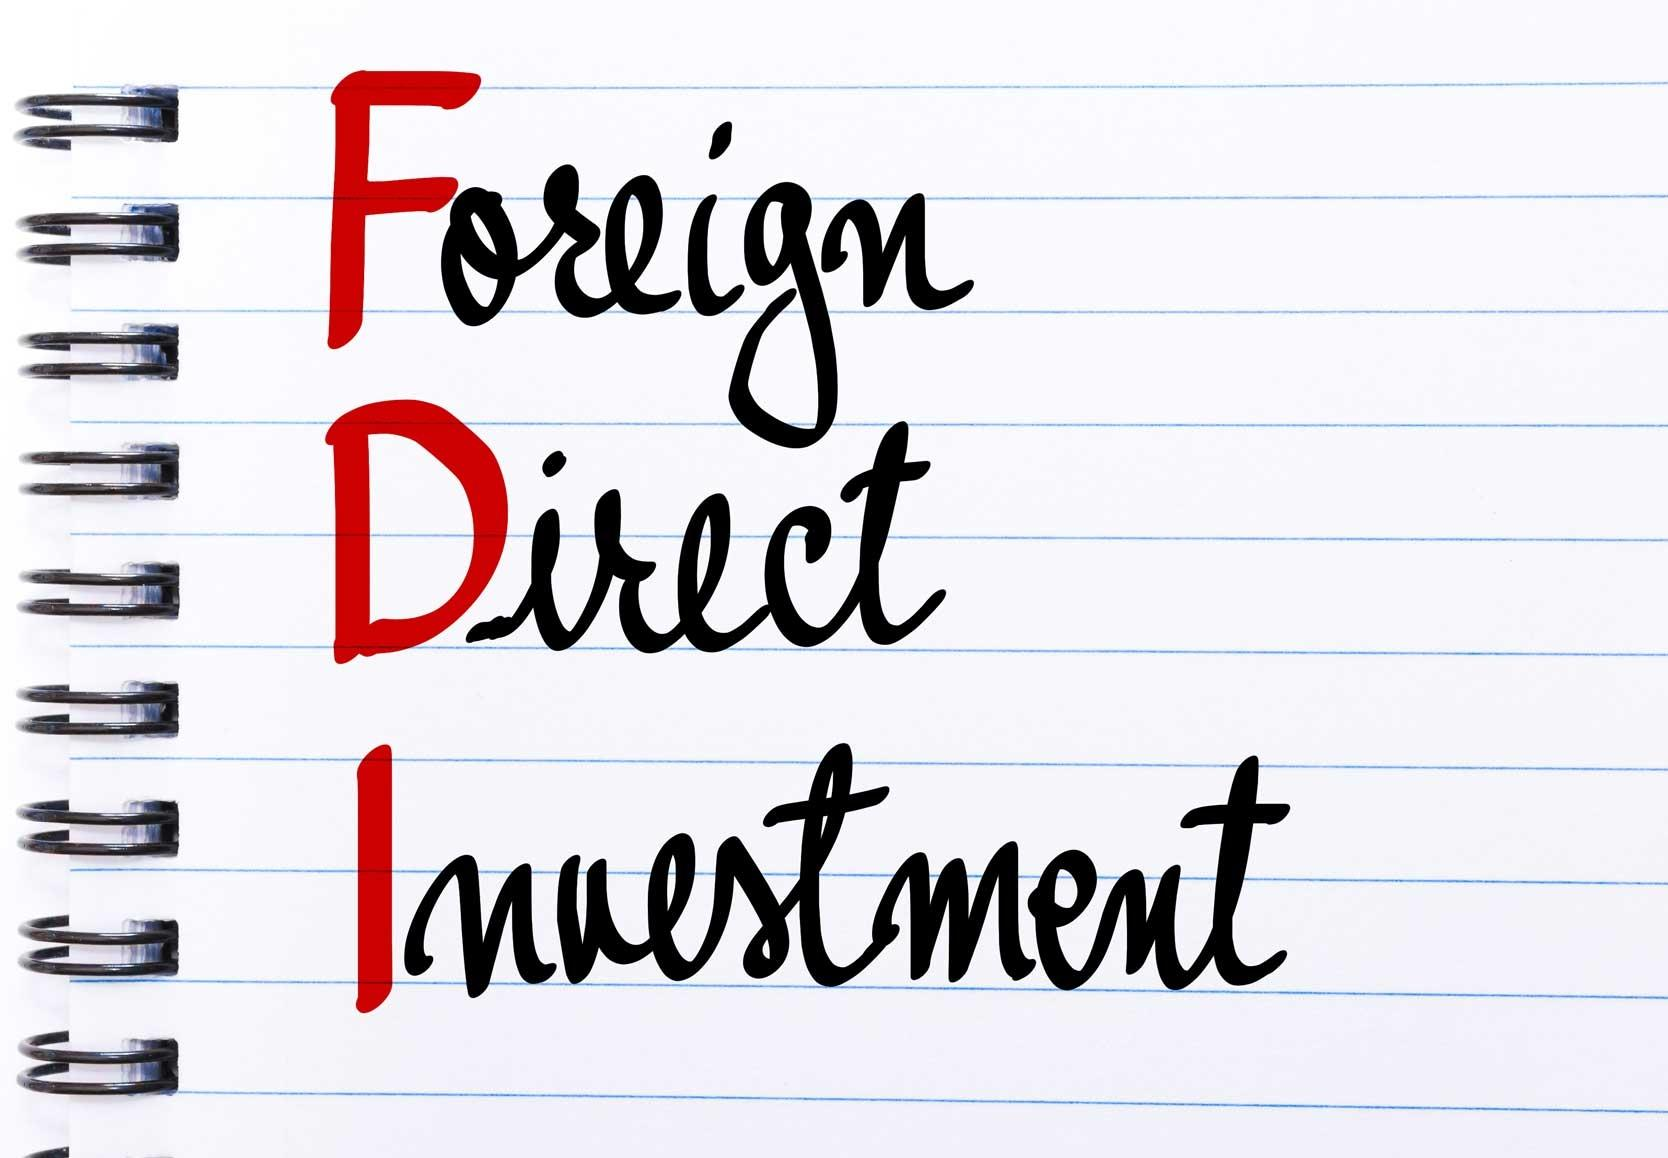 FDI in Bulgaria in January-August 2018 was 230.5M euro